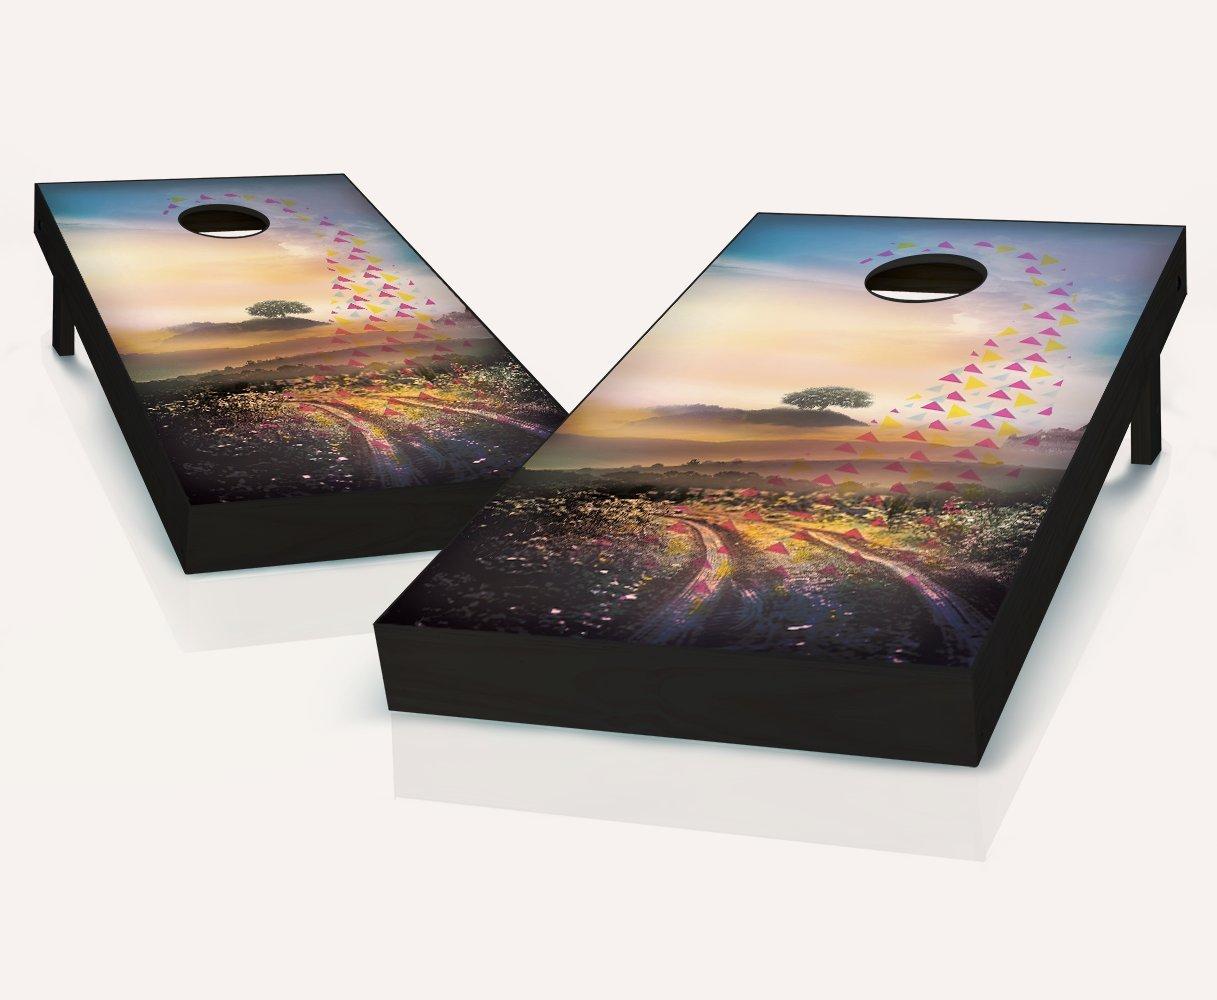 Tailgating Pros Dream Weaver Cornhole Boards withのセット8 Cornhole Bags B07BWK25VV